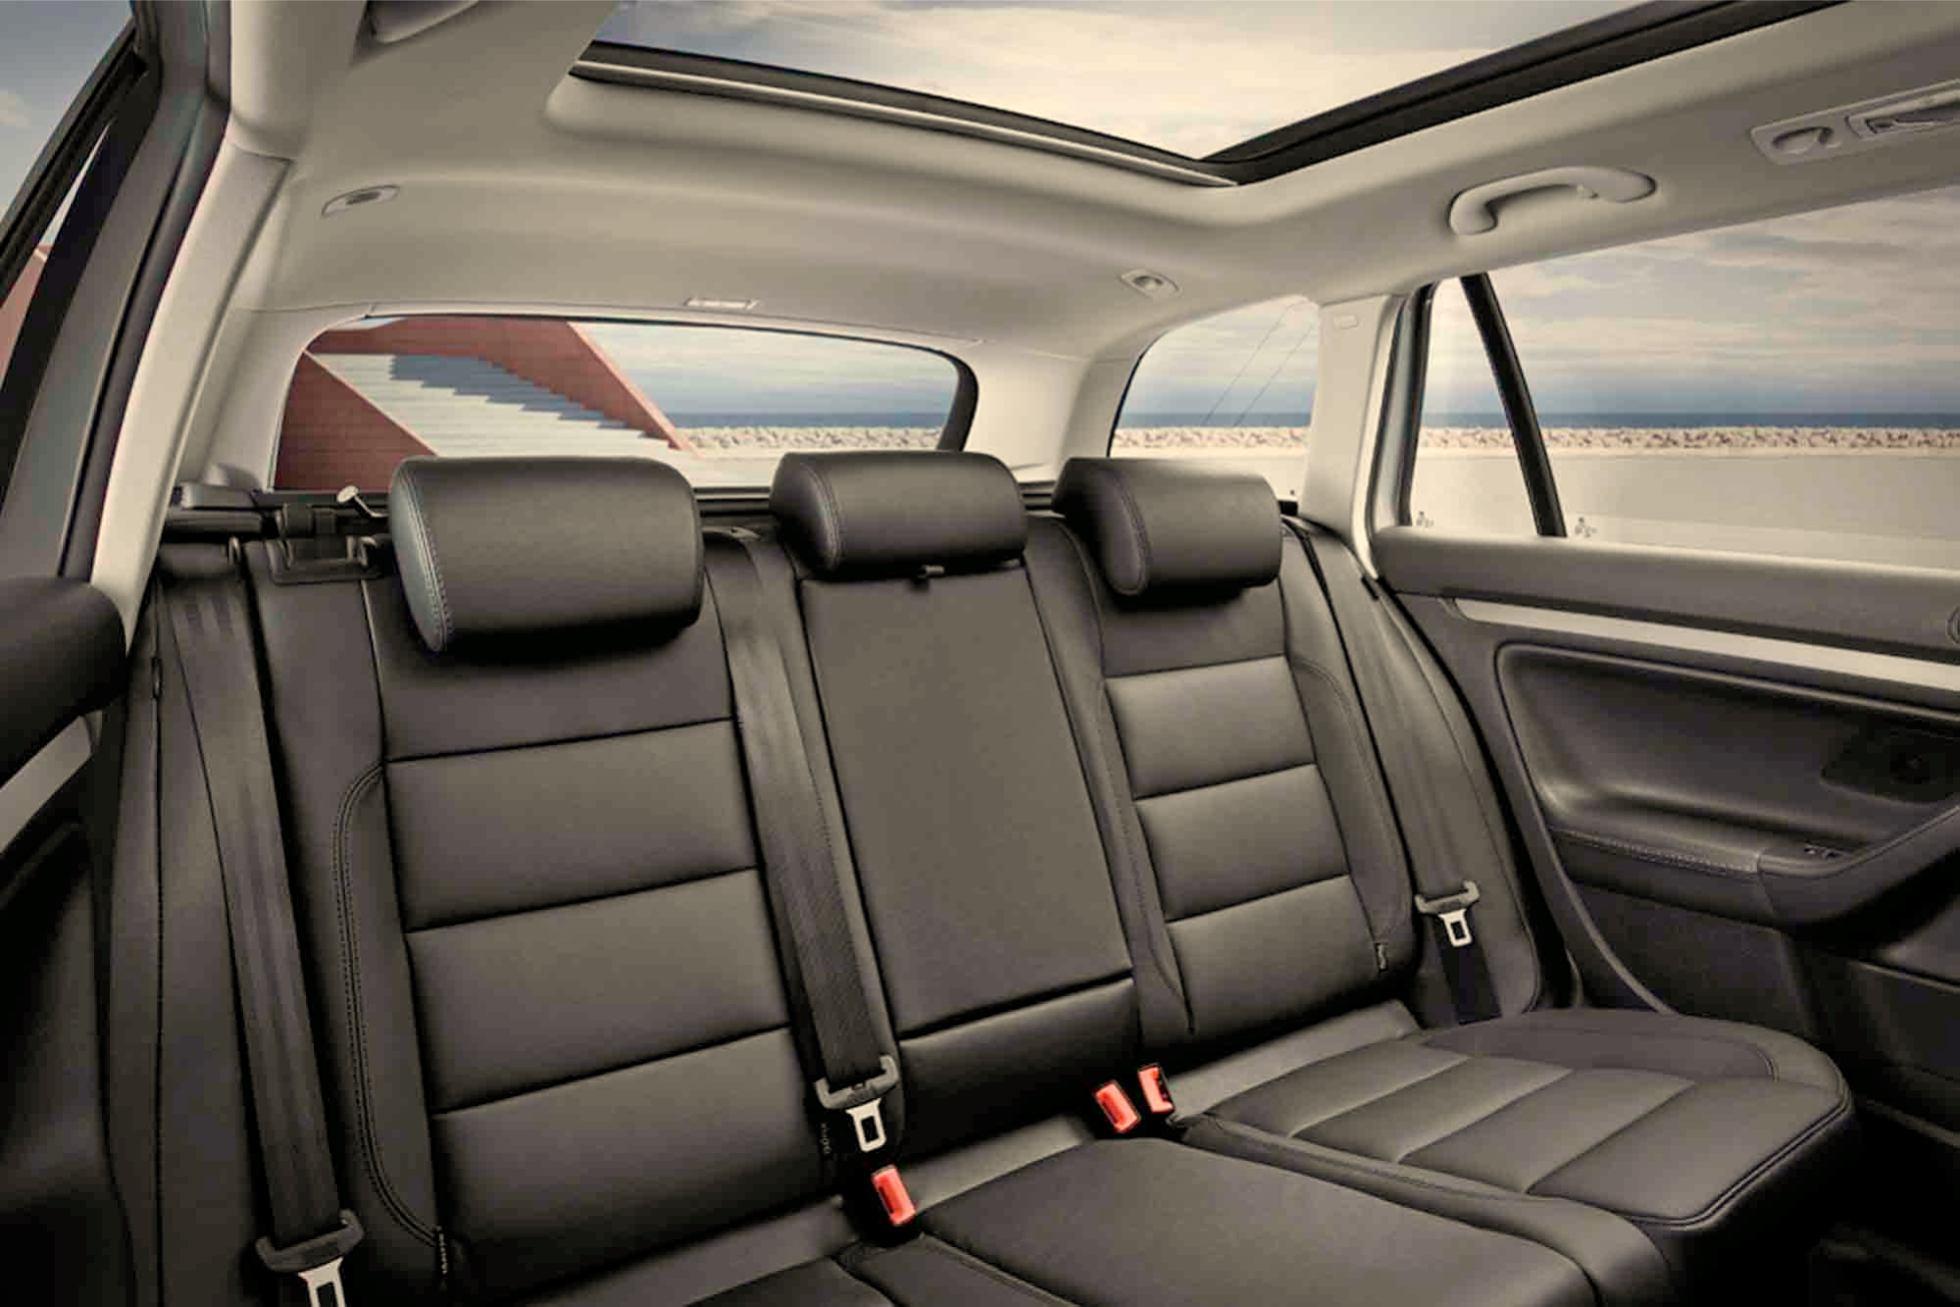 Volkswagen golf variant voiture pour lui for Voiture golf 7 interieur